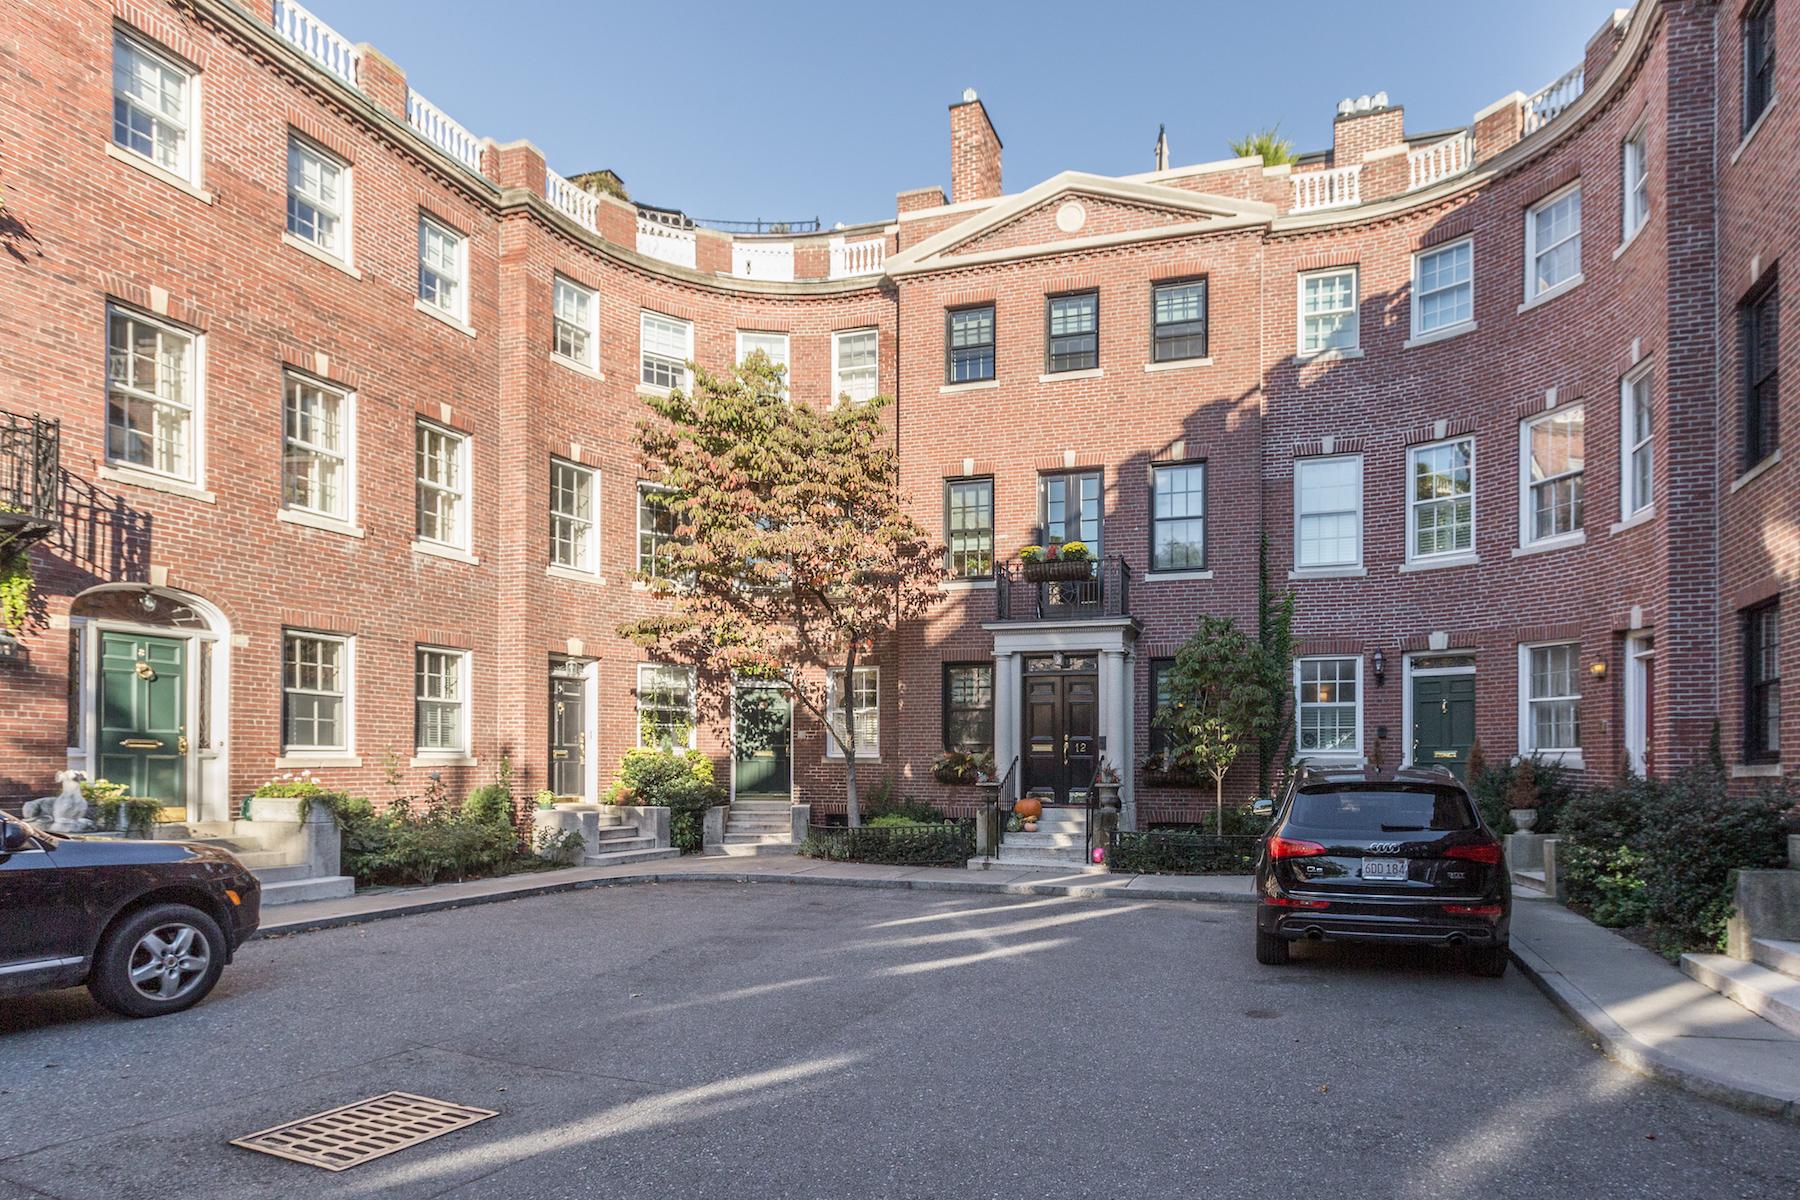 独户住宅 为 销售 在 Hidden Jewel On The Flat Of Beacon Hill 10 Charles River Square, Beacon Hill, 波士顿, 马萨诸塞州, 02114 美国